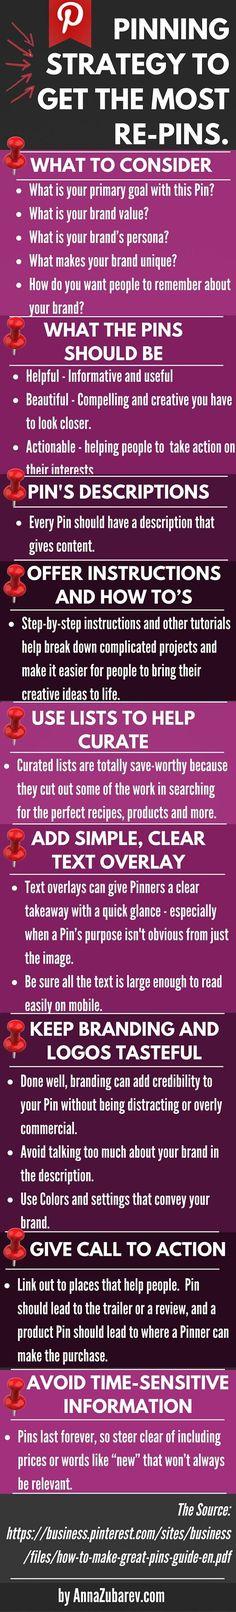 Pinning Strategy Checklist To Get The Most Repins. via @Anna Zubarev | Pinterest Expert  :